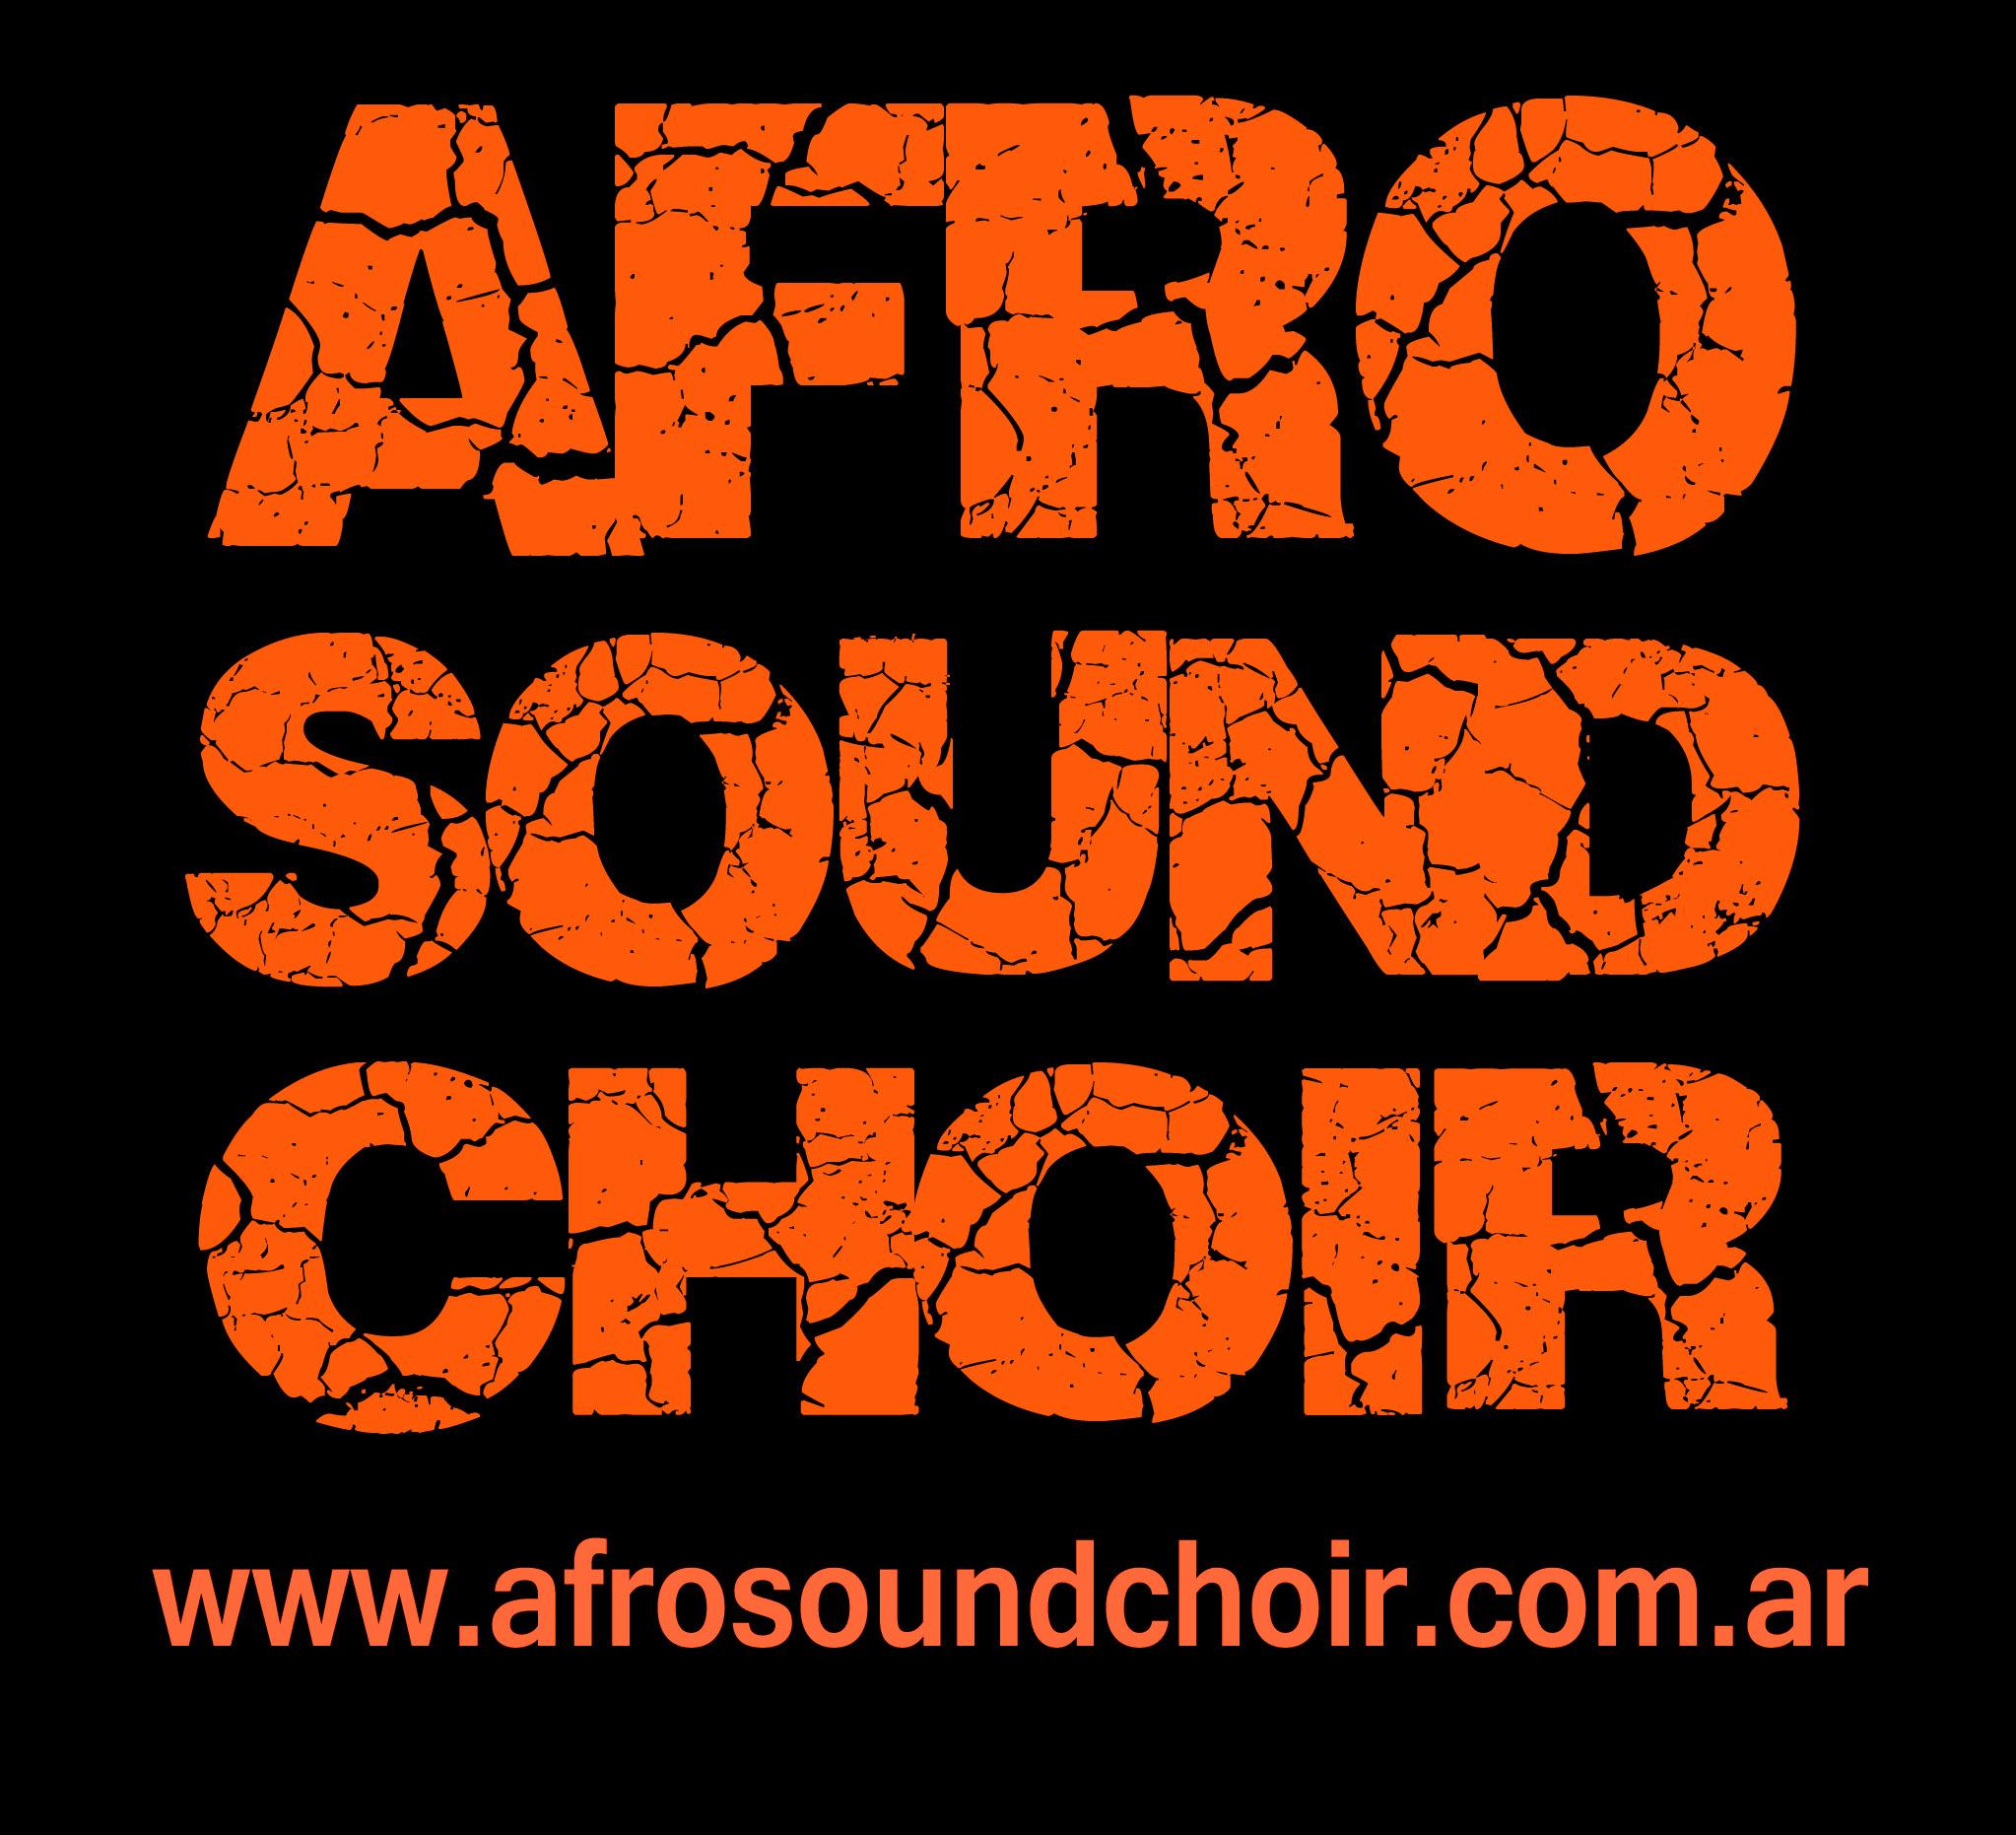 AfroSound Choir